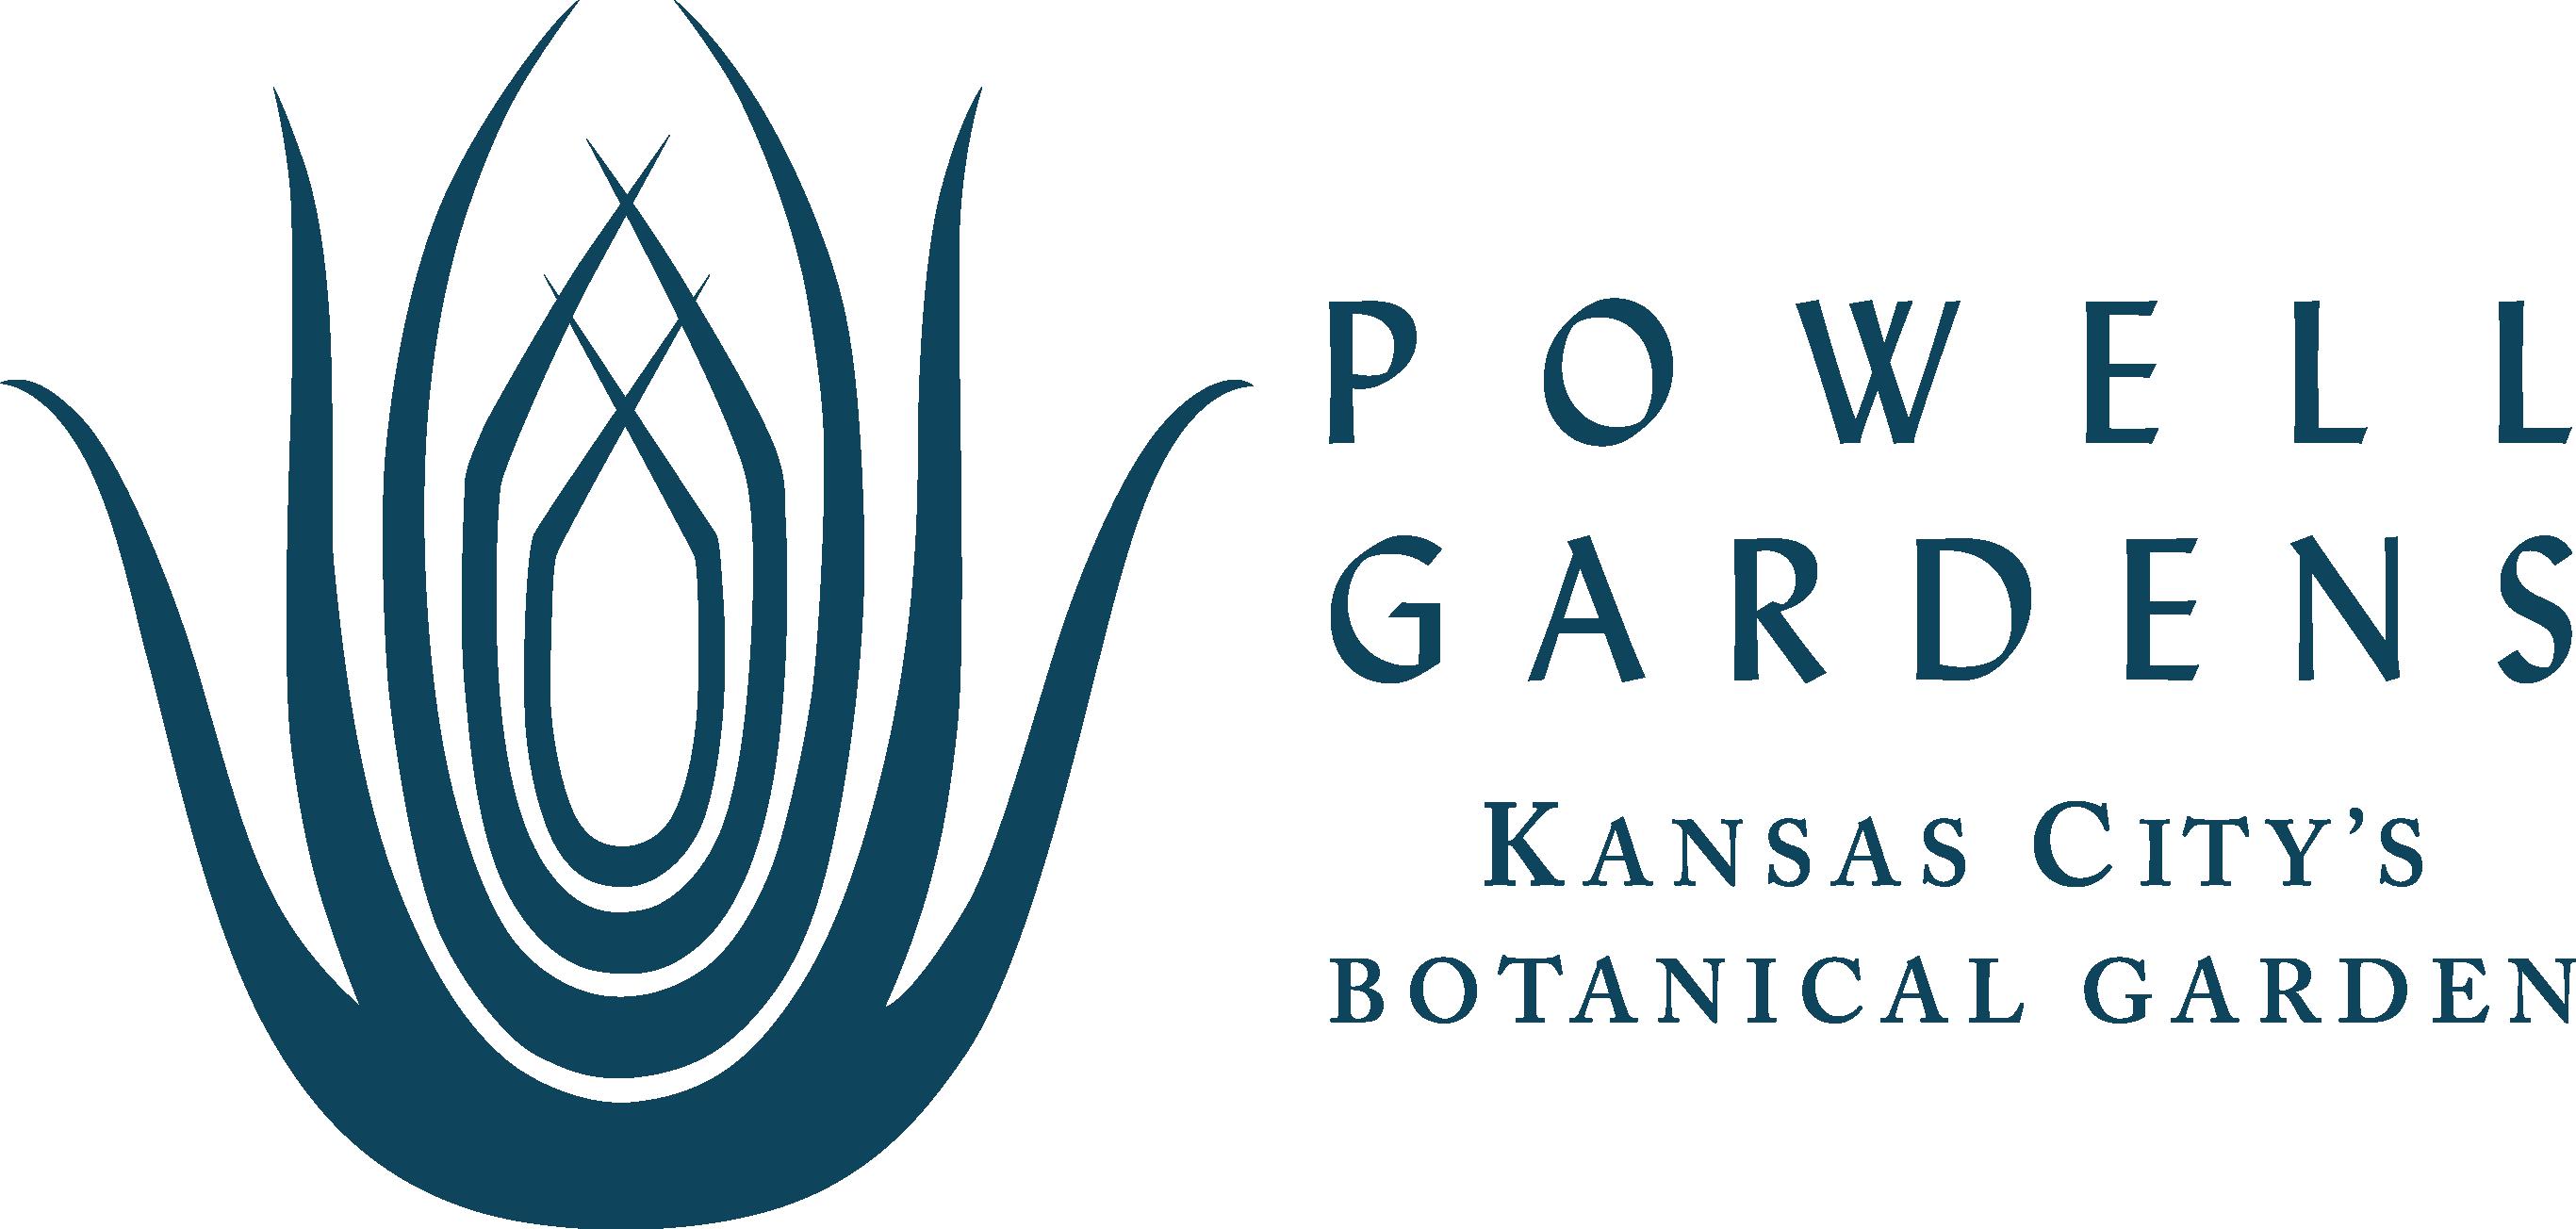 Powell Gardens -